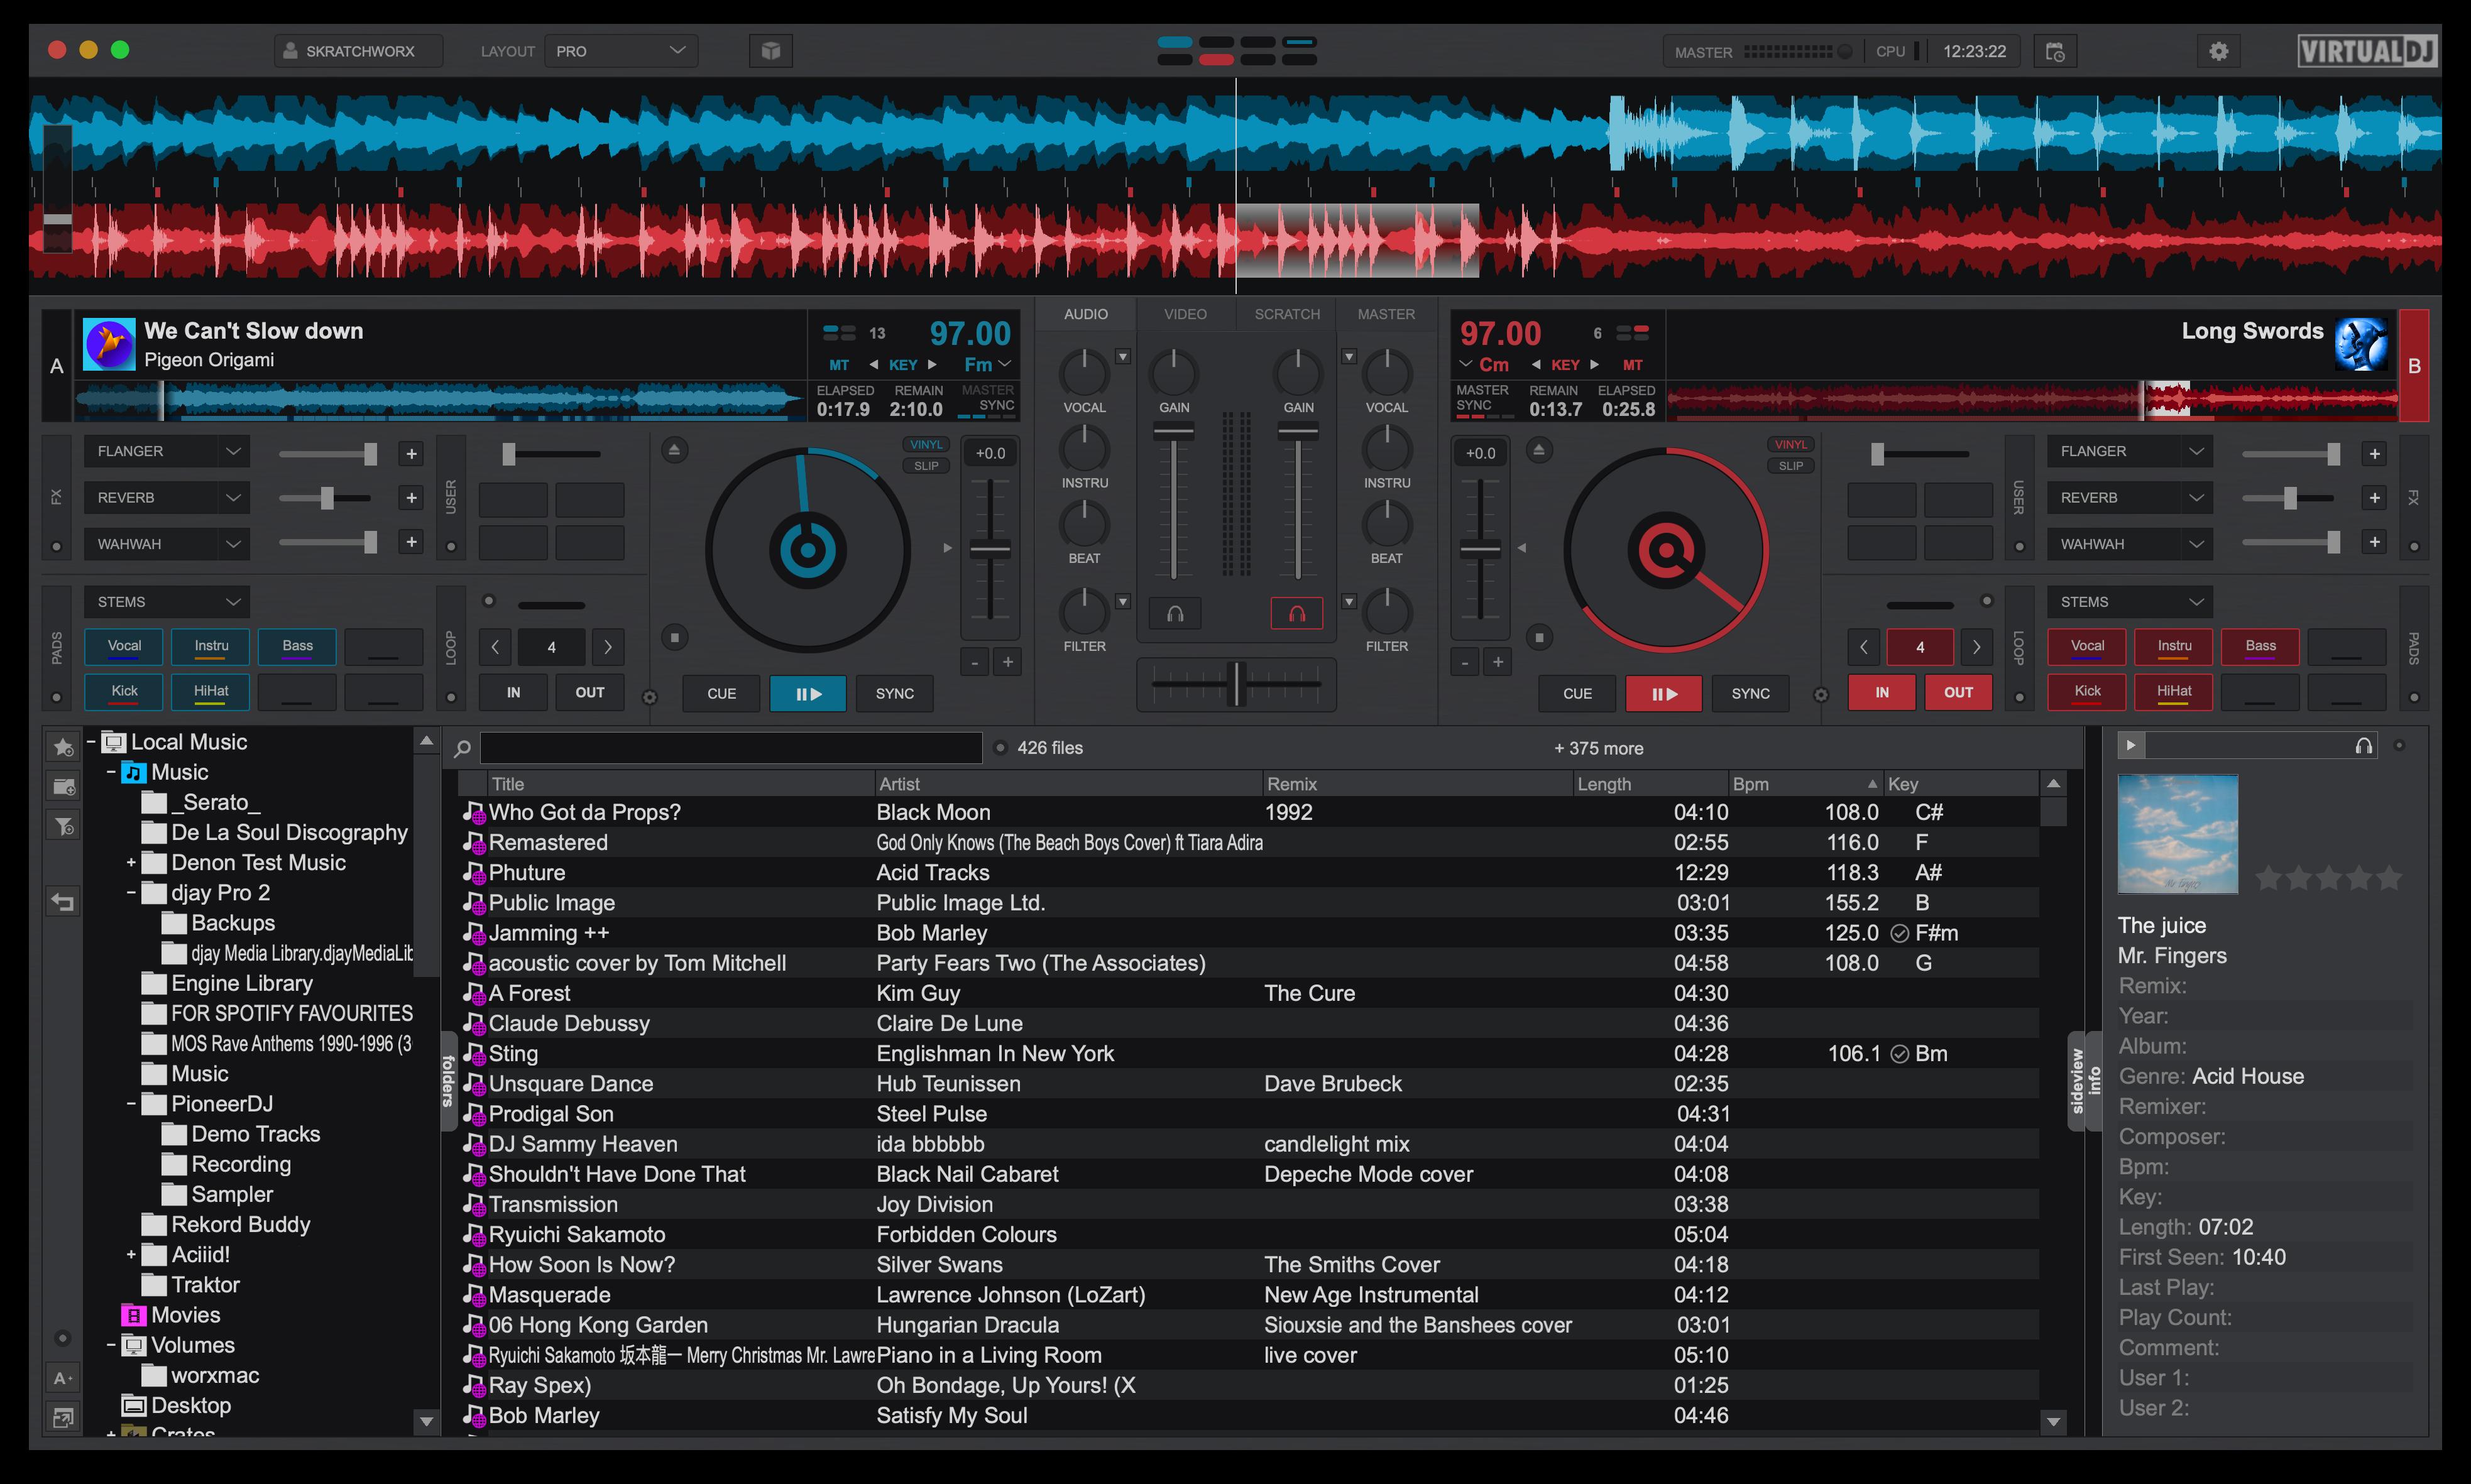 djay Pro AI Neural Mix VirtualDJ 2021 Spleeter stems audio source separation (3)